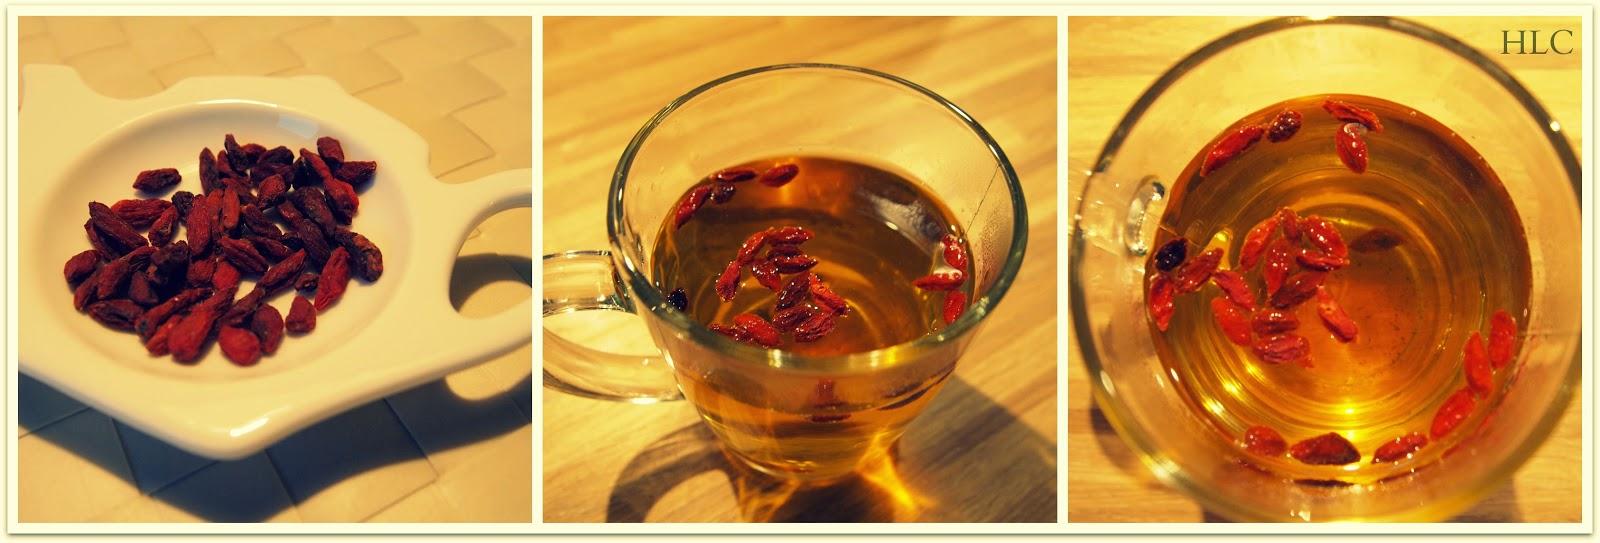 jagody goji do herbaty